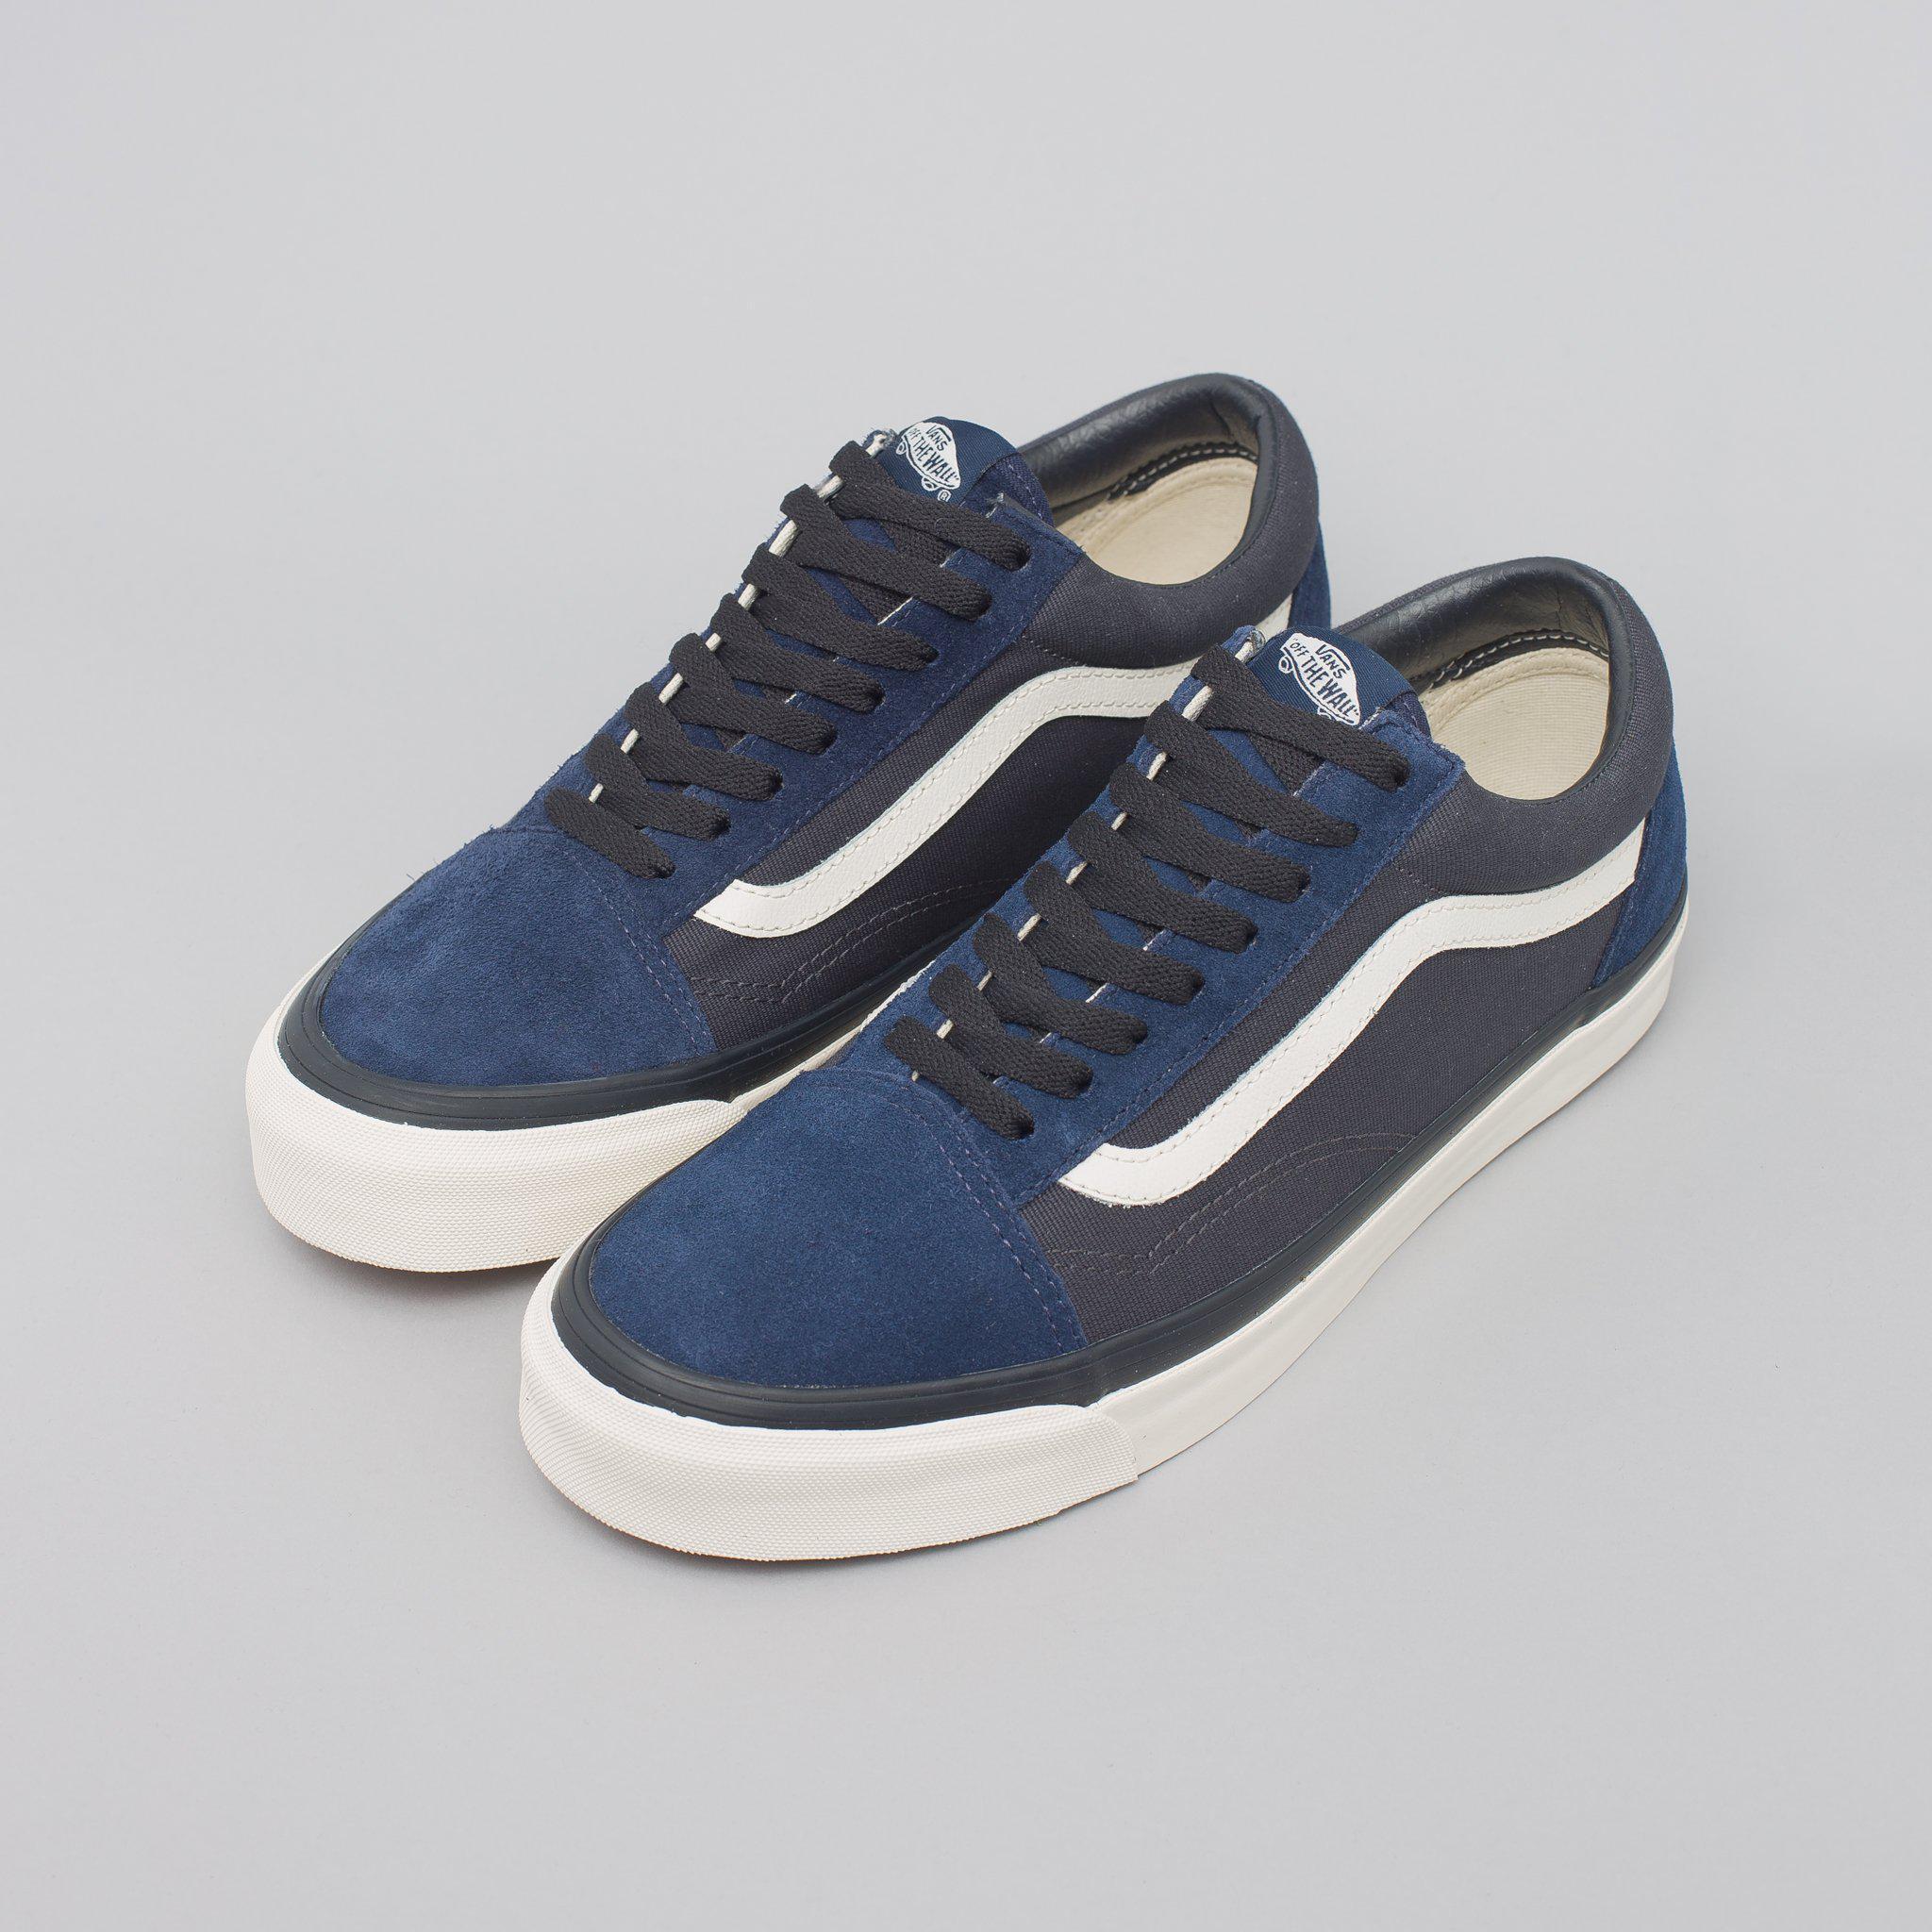 f3baac2655 Gallery. Men s Cap Toe Sneakers Men s Vans Classic Old Skool ...